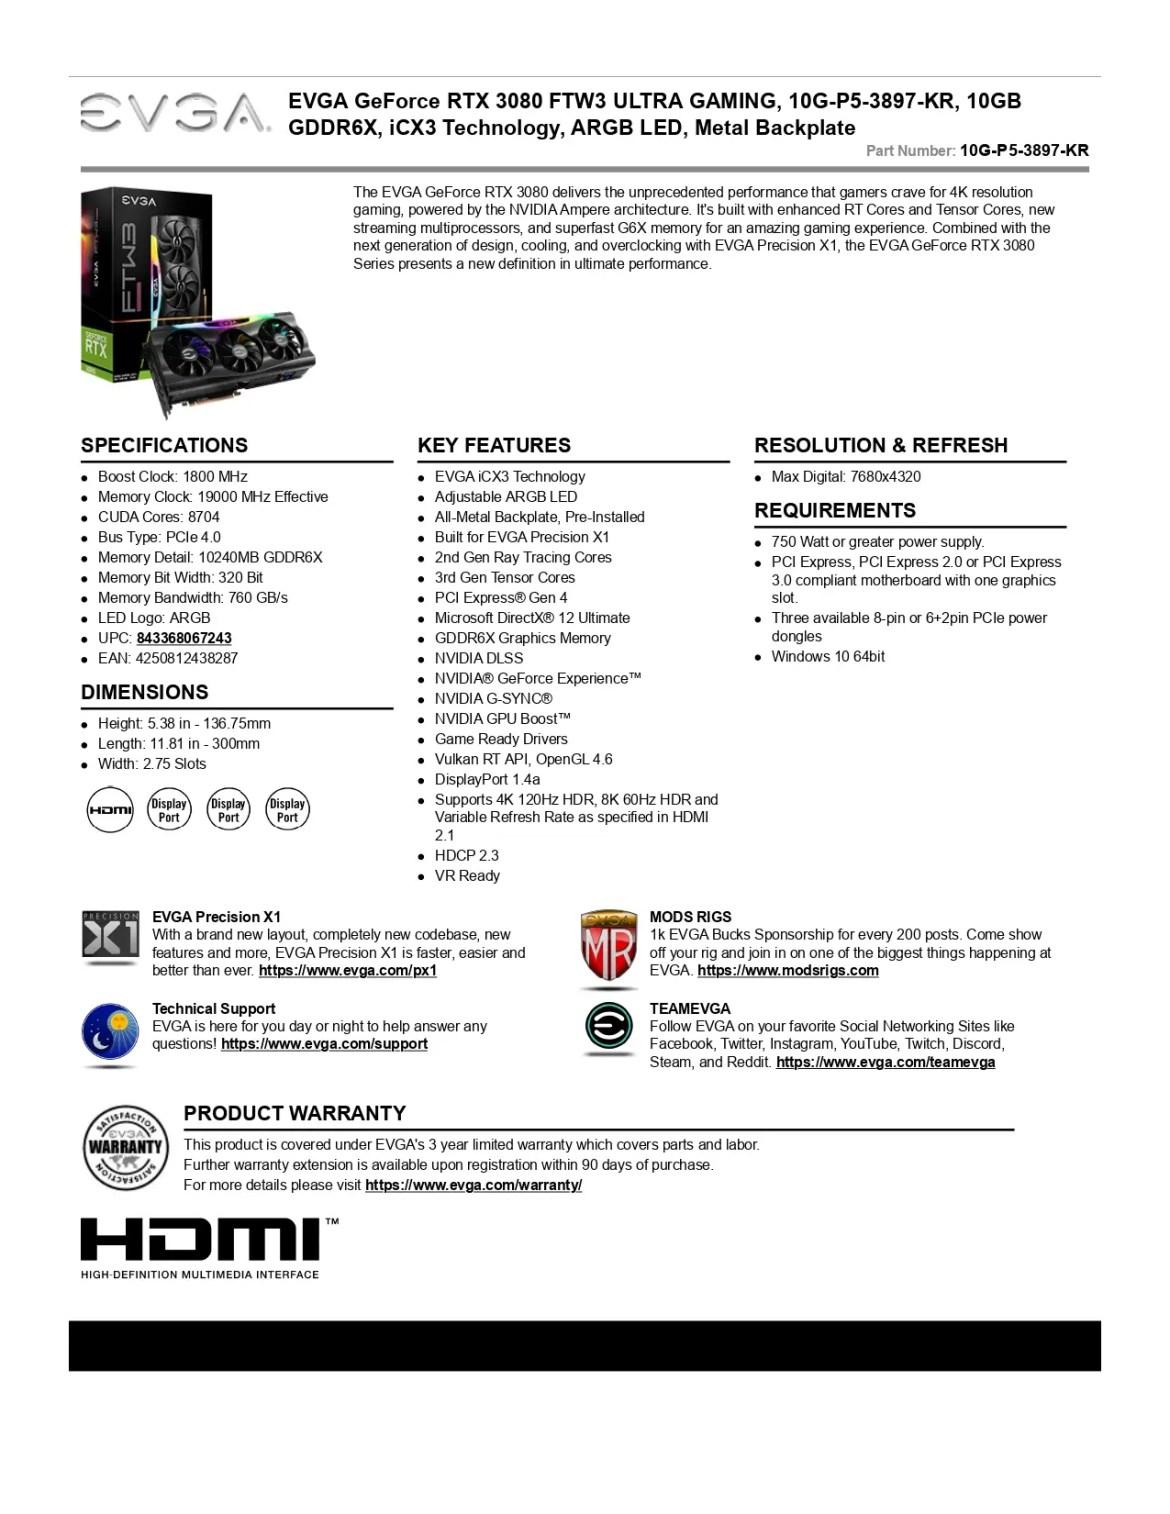 EVGA GeForce RTX 3080 FTW3 ULTRA GAMING Graphics Card (10G-P5-3897-KR)